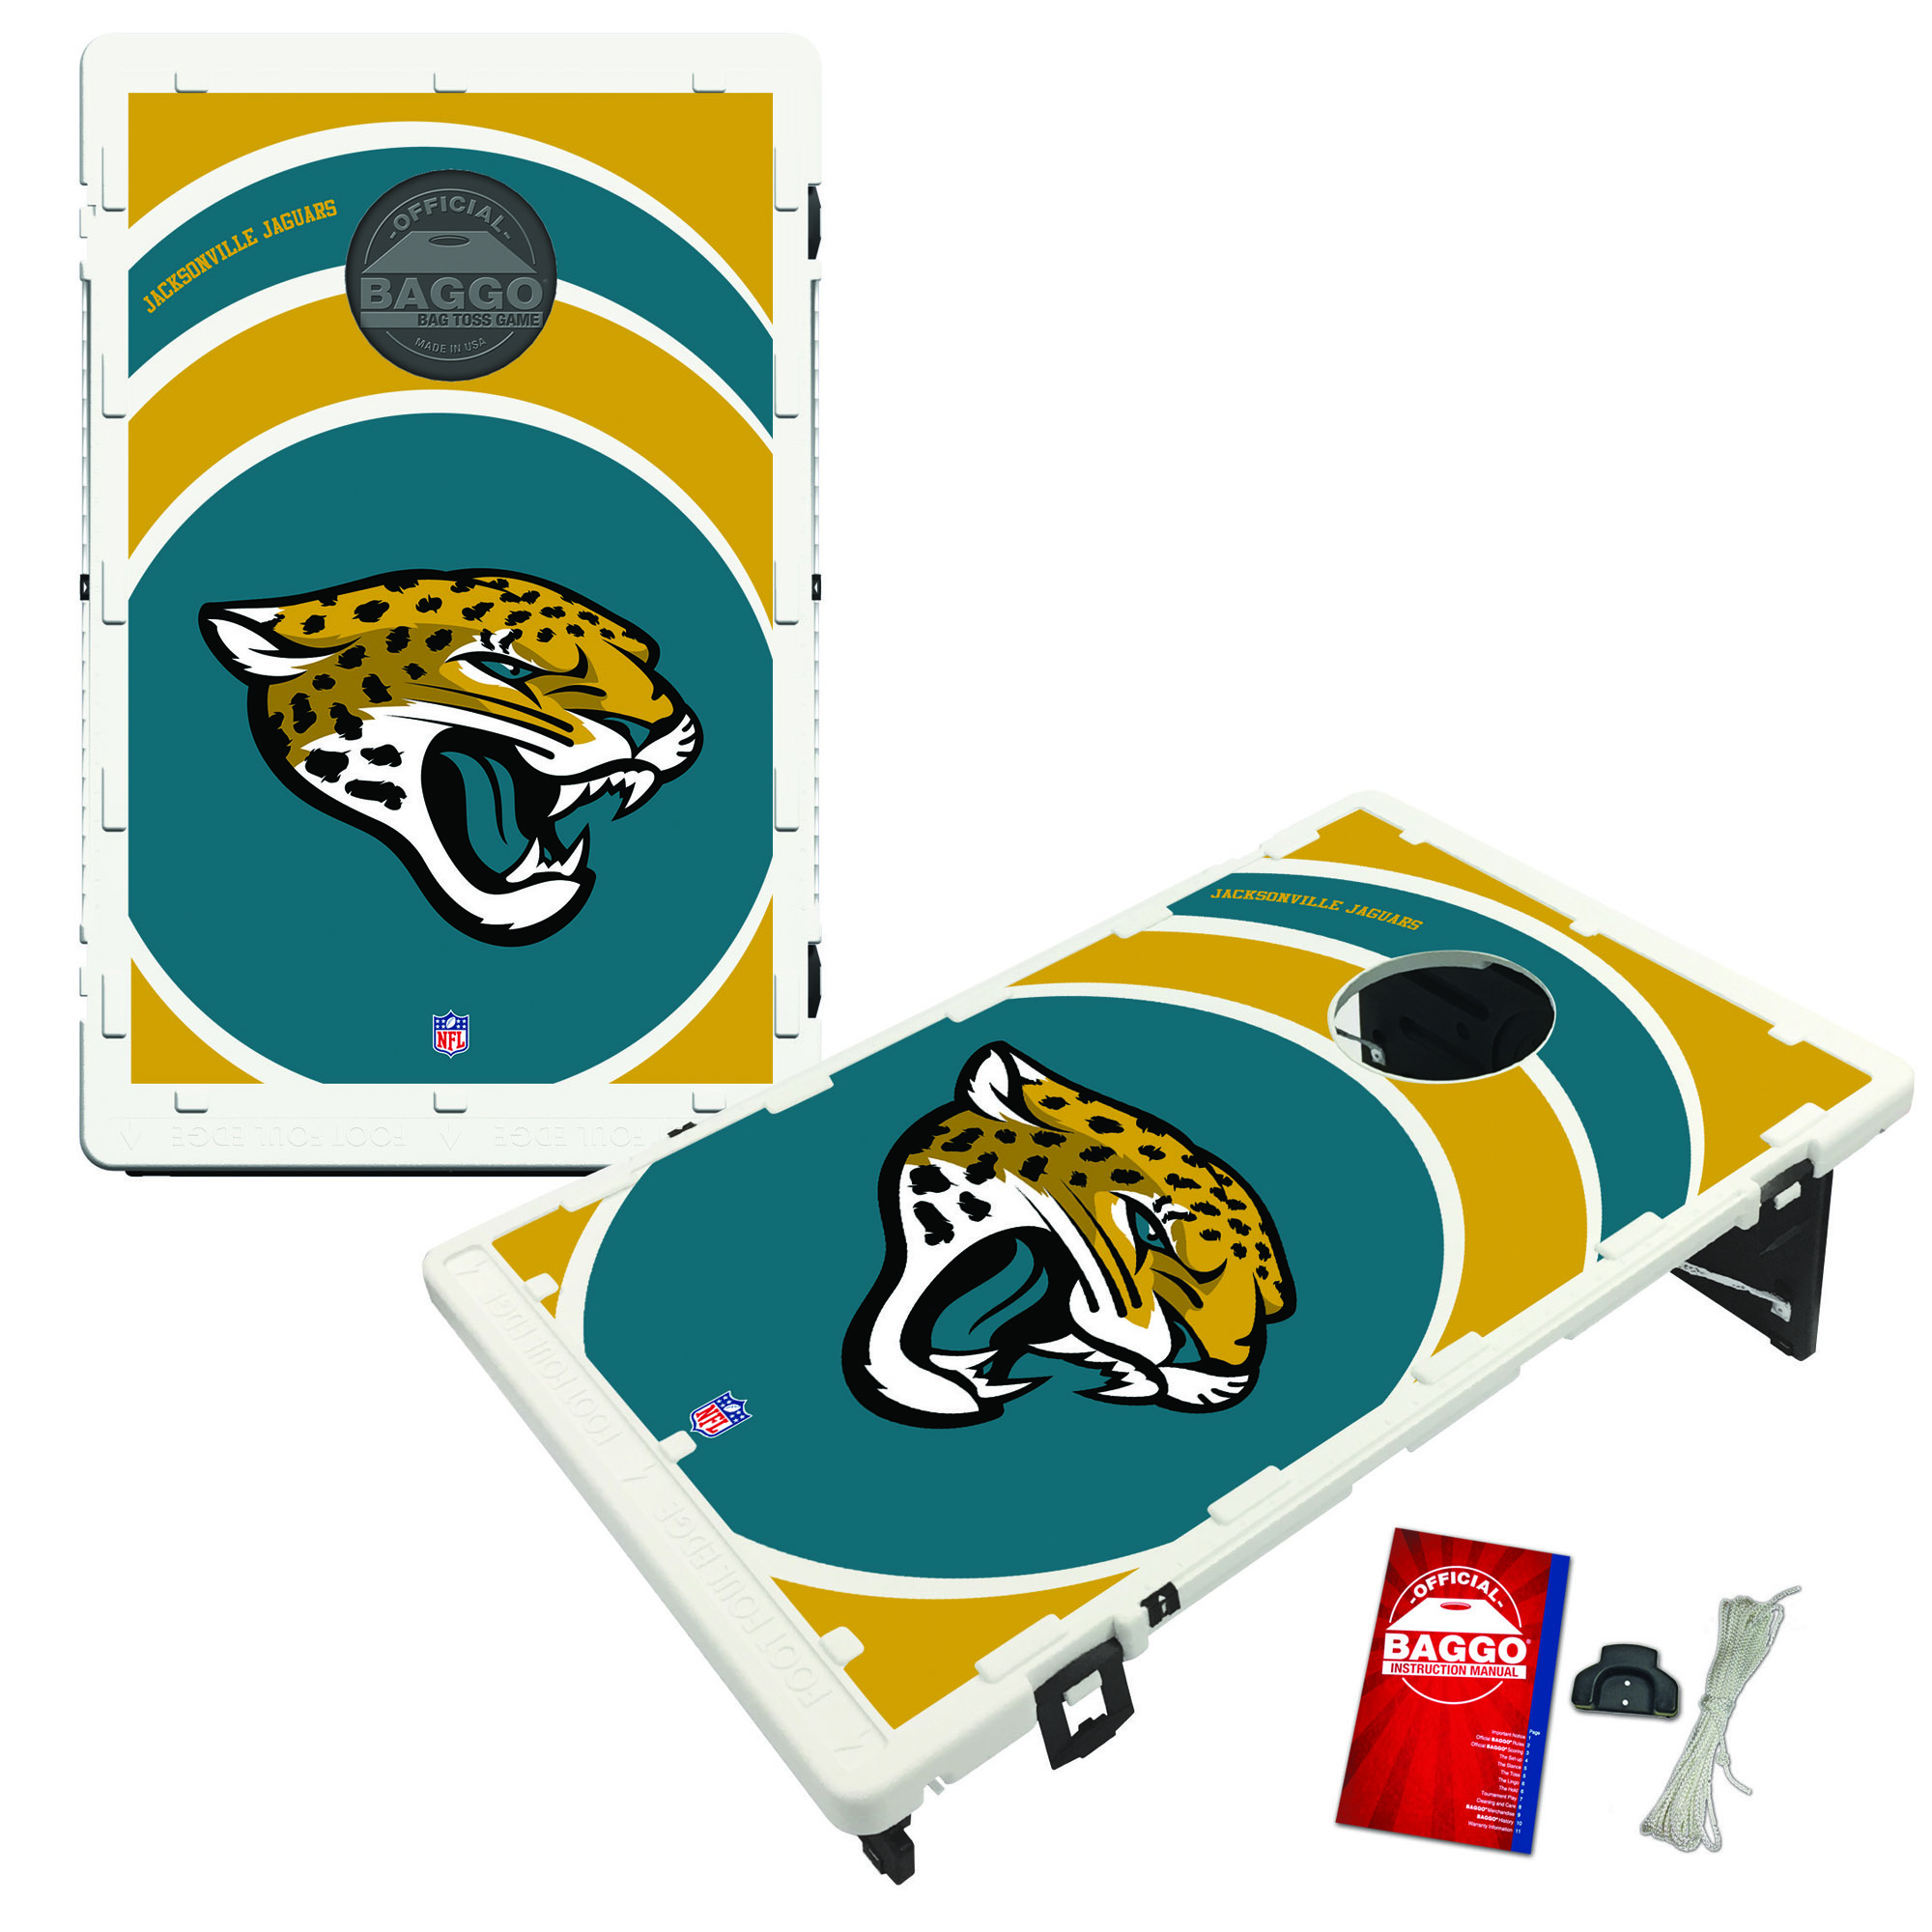 Jacksonville Jaguars 2' x 3' BAGGO Vortex Cornhole Board Tailgate Toss Set